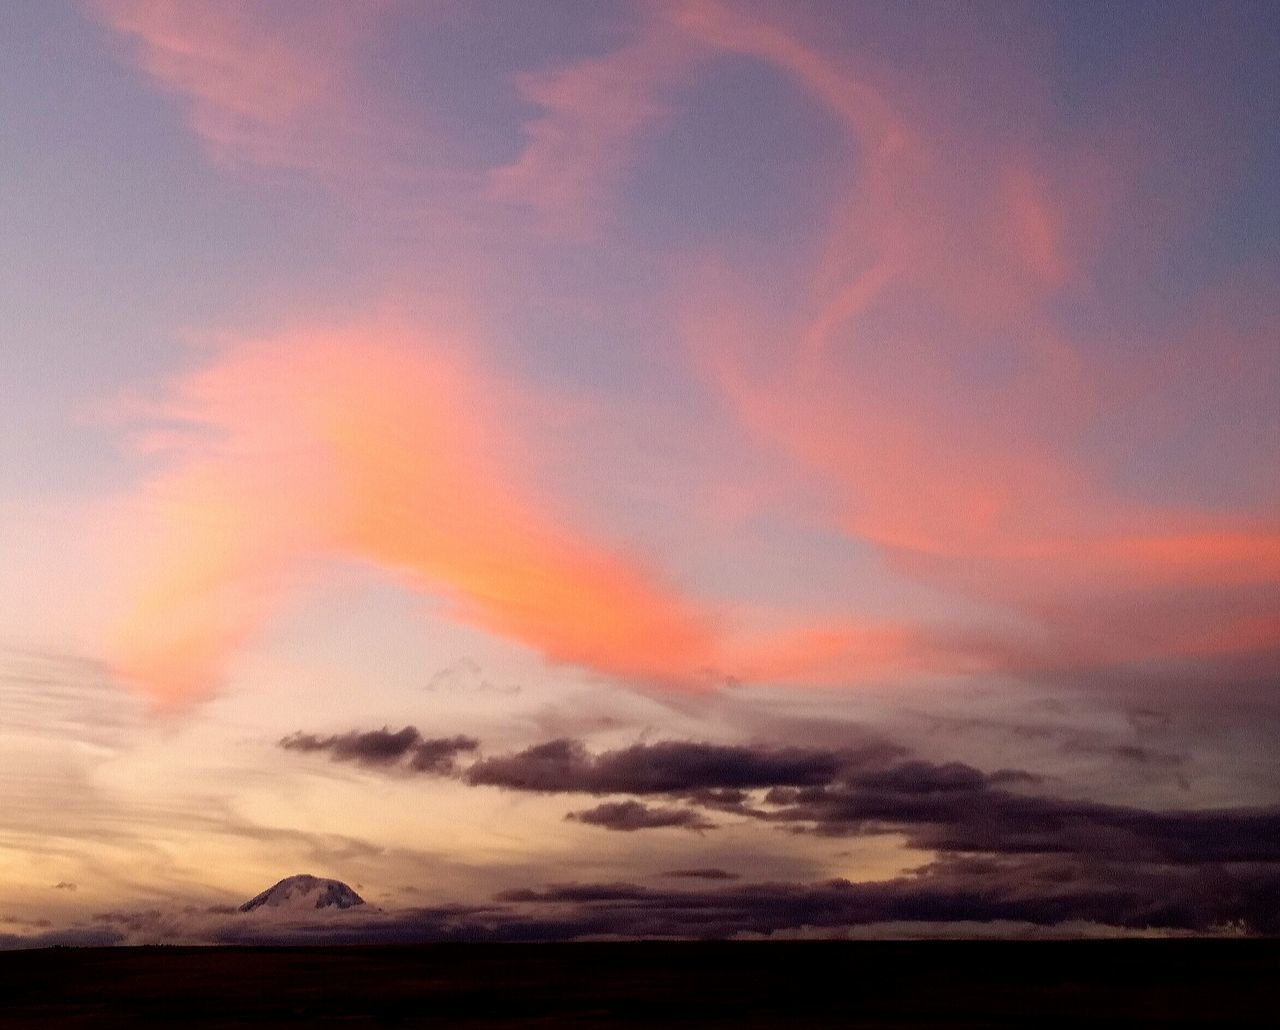 Mt. Adams Washington Mt.adams Washington Sunset Tranquil Scene Beauty In Nature Sky Scenics Cloudscape Atmospheric Mood Romantic Sky Sol The Gorge Sunset